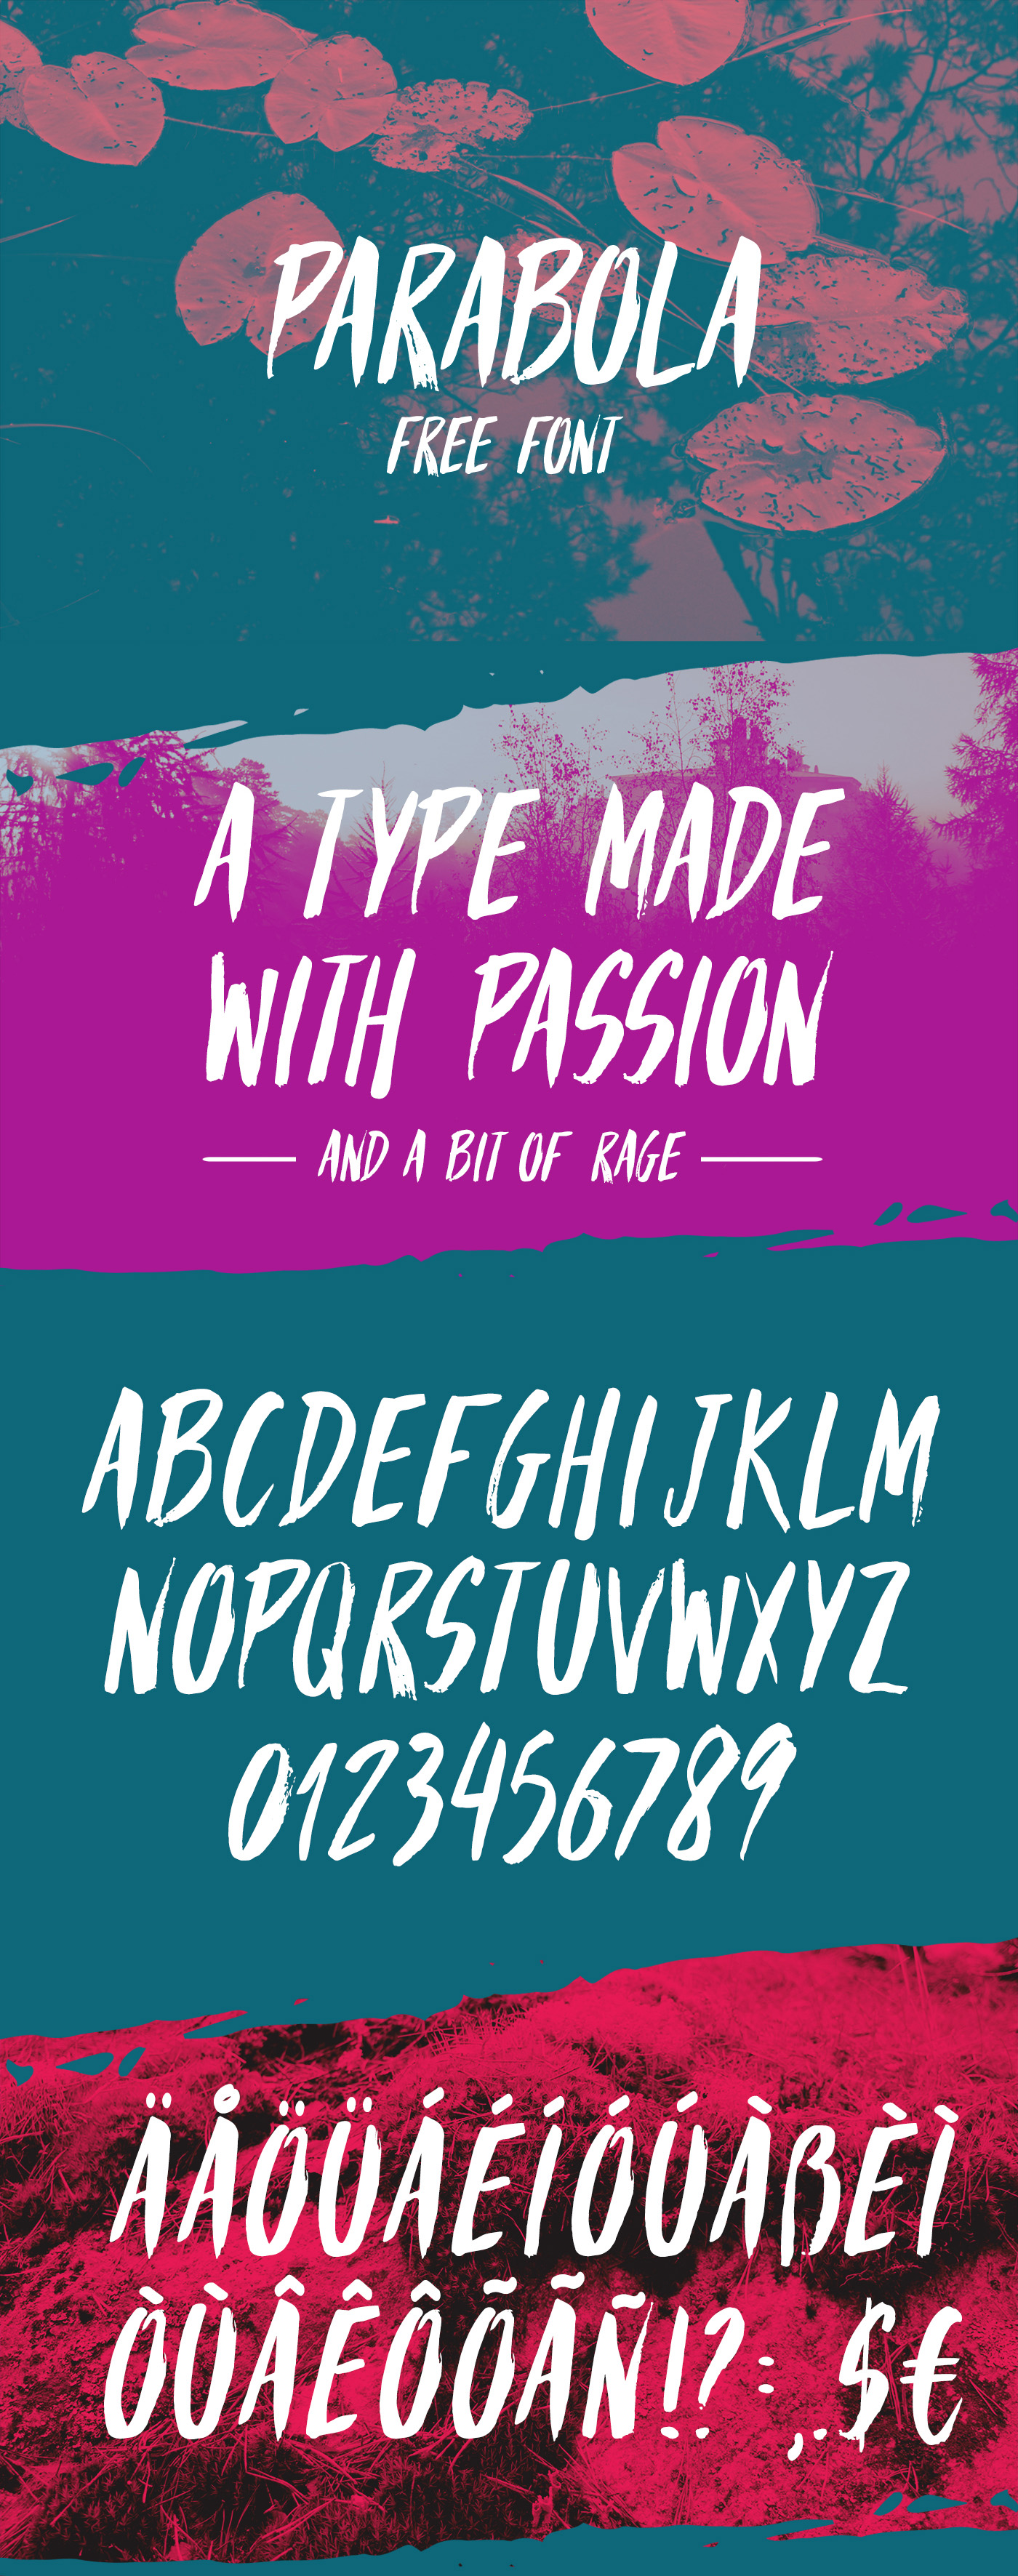 Parabola free font